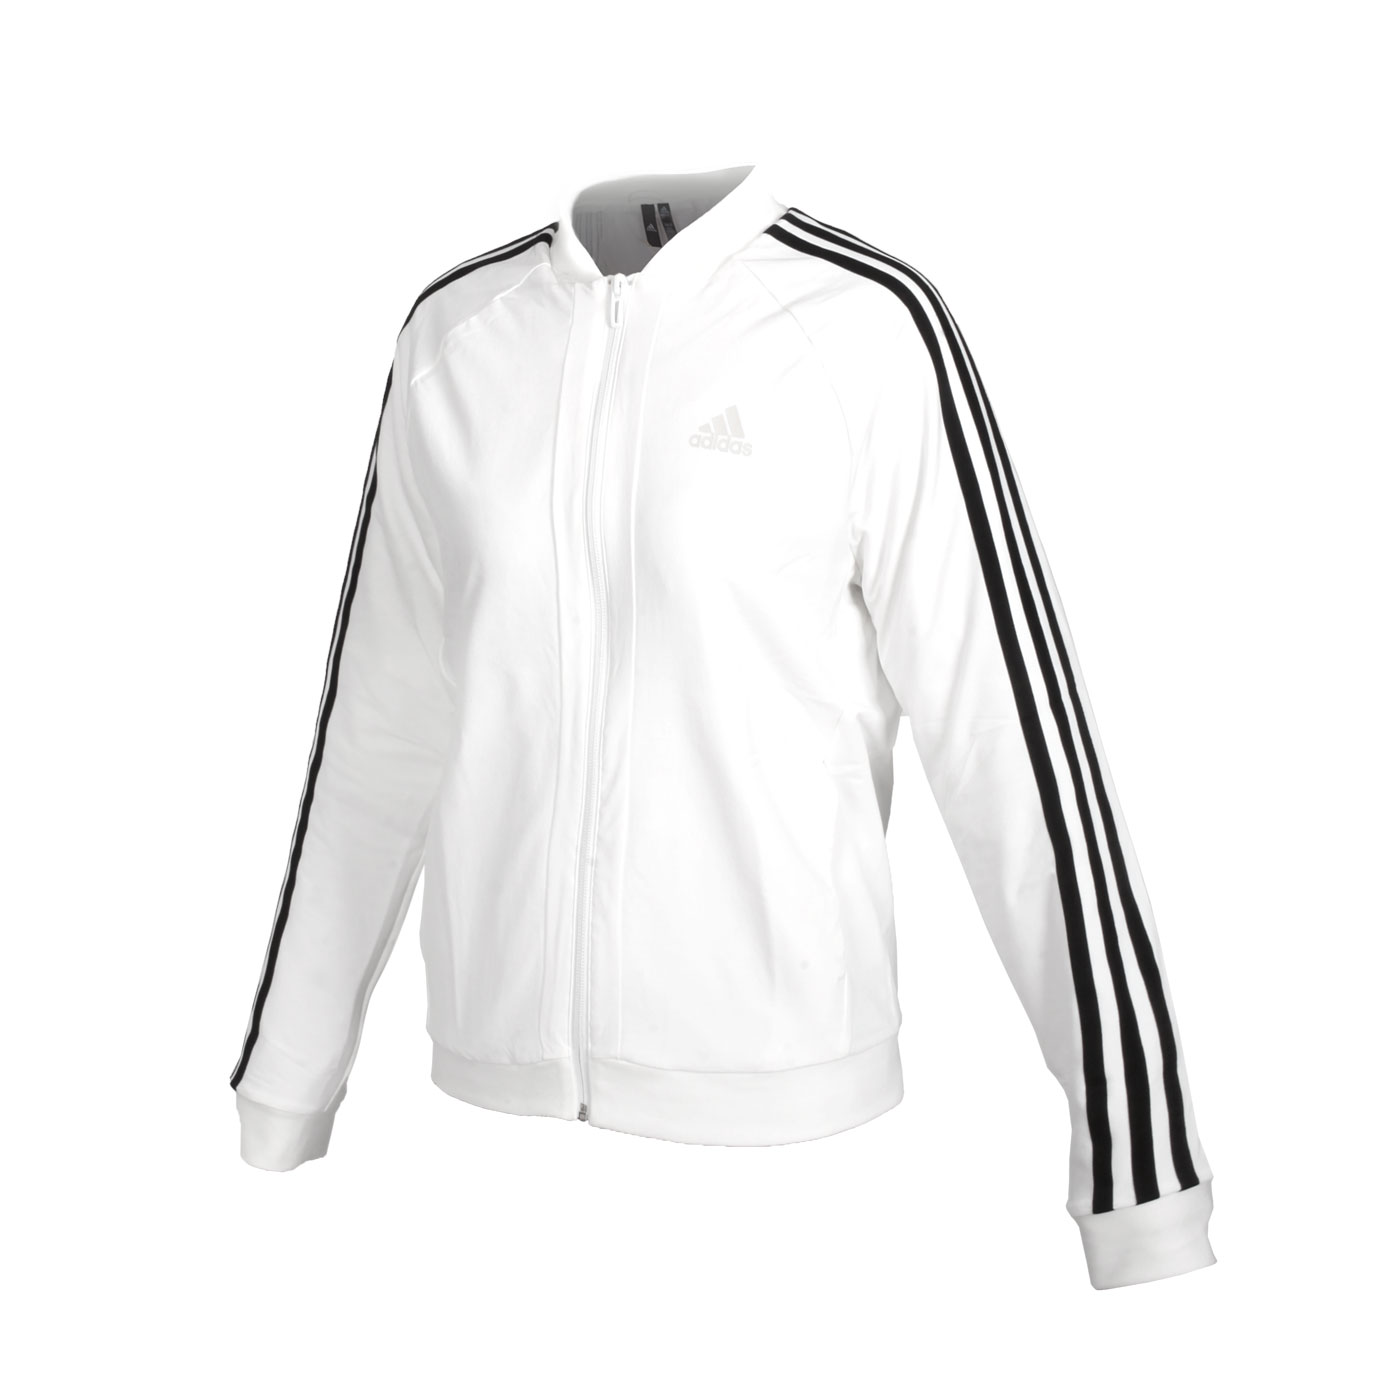 ADIDAS 女款運動外套 GF0182 - 白黑